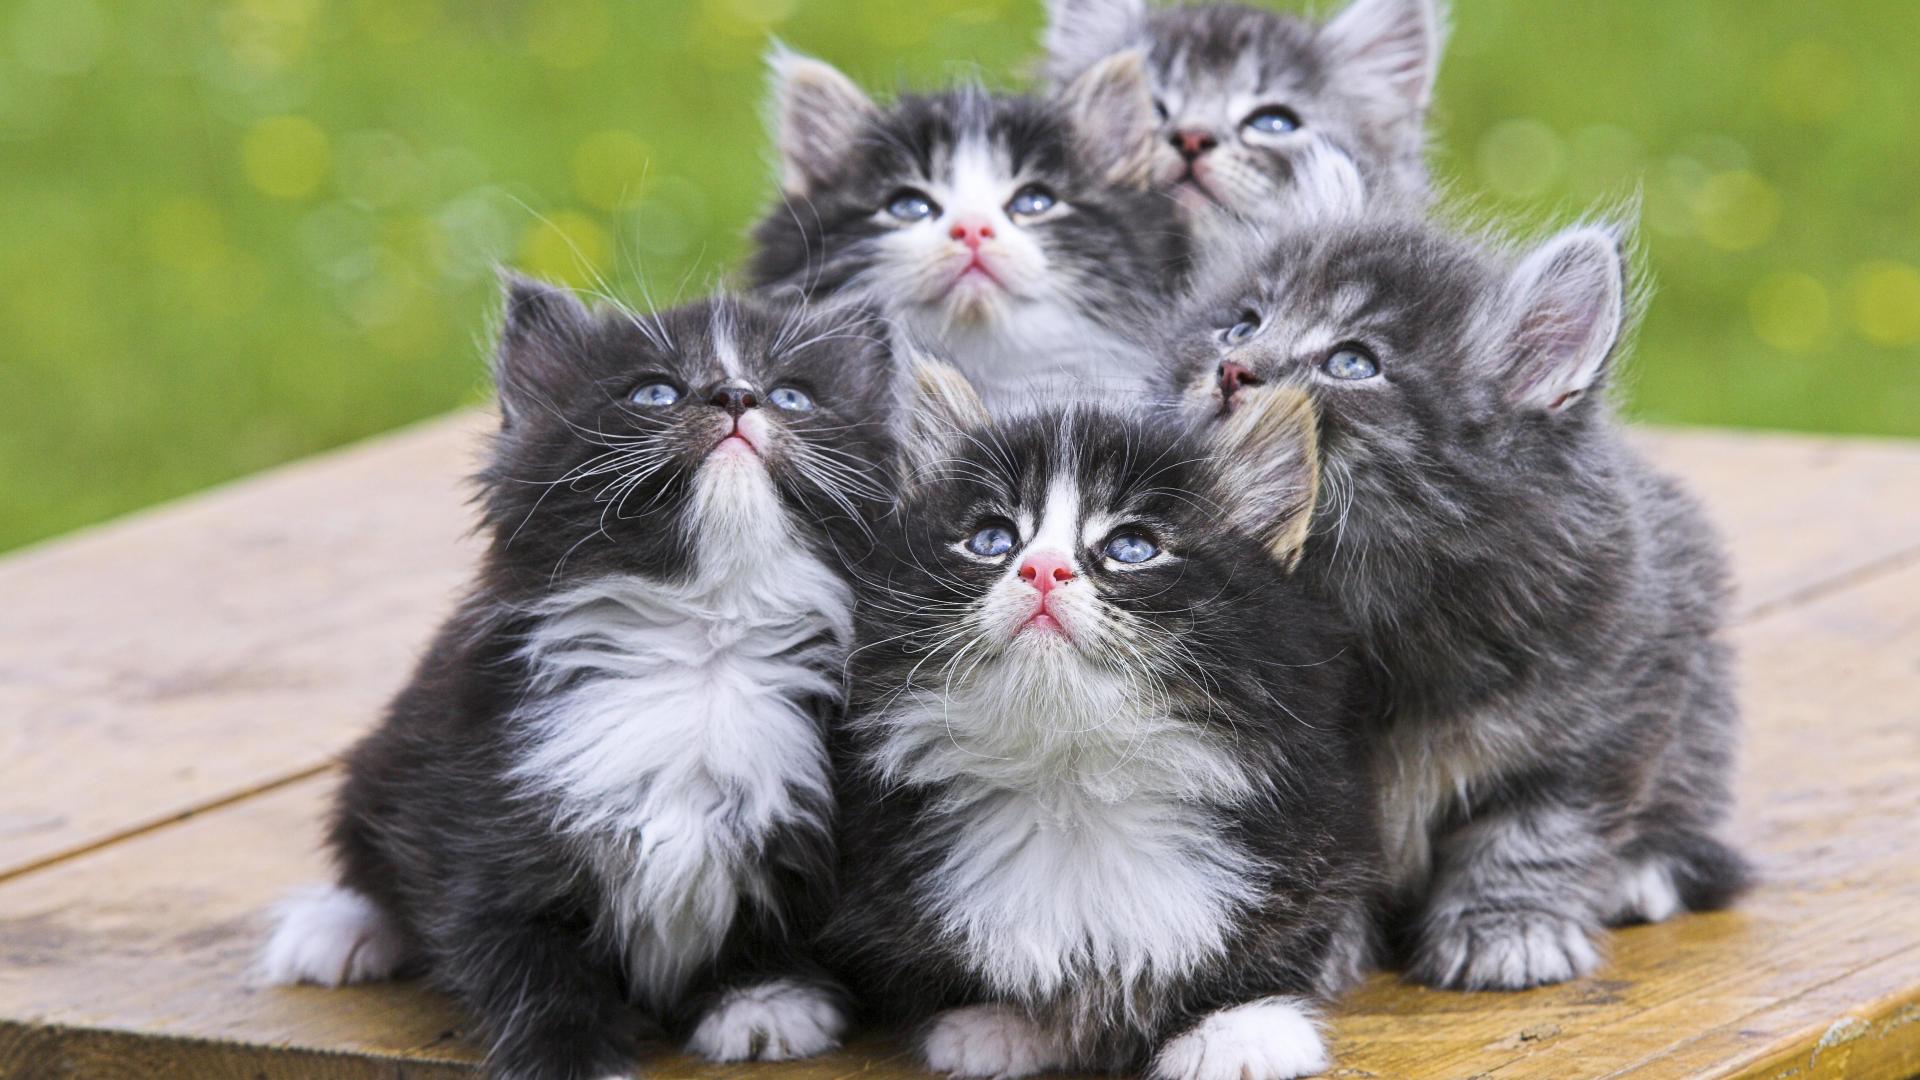 Three White Kittens In A Basket wallpaper animals Wallpaper